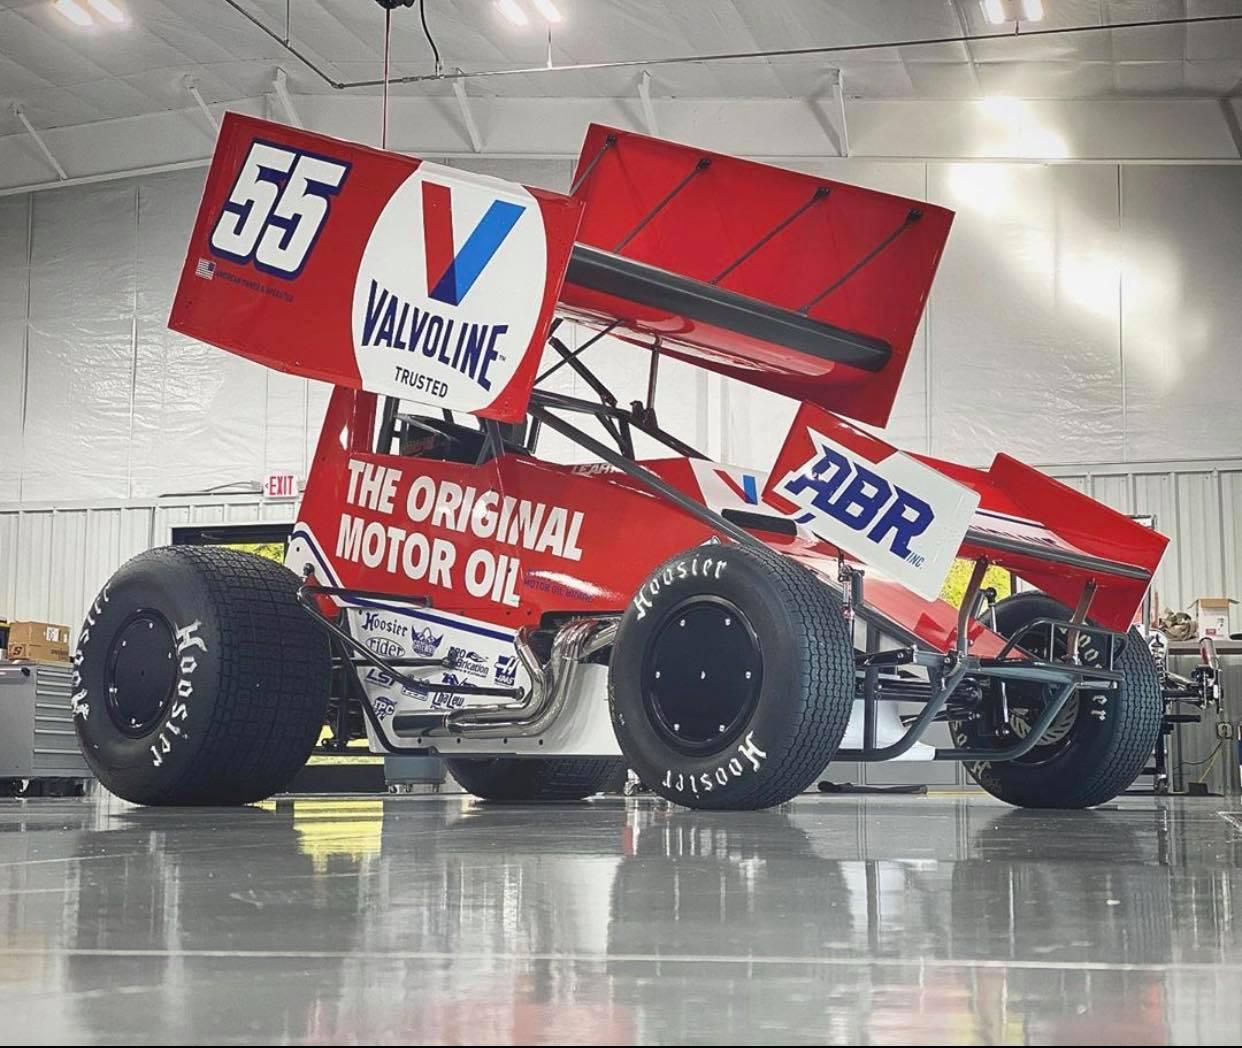 Alex Bowman Racing - 55 Sprint Car